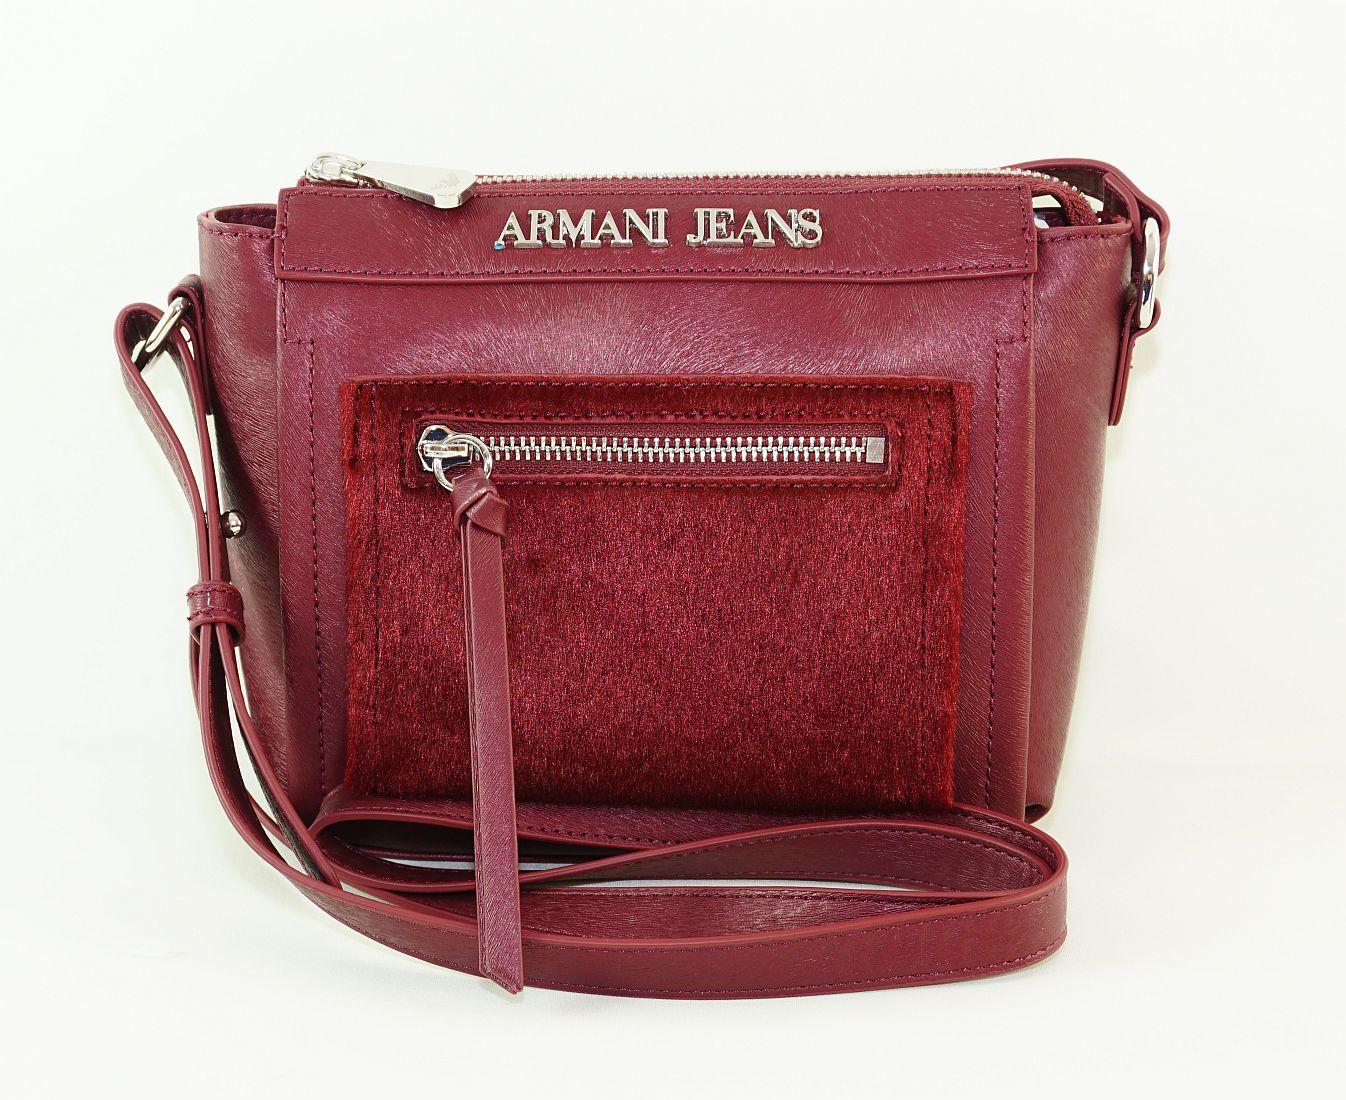 Armani Jeans Handtasche Shopper Tasche WOMEN'S SLING BAG 922104 6A728 00176 Bordeaux HW16-1